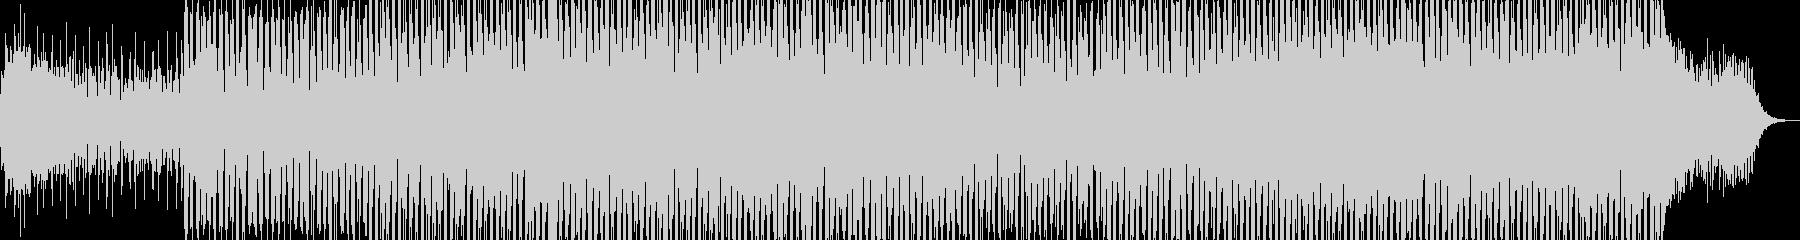 EDMポップで明るいクラブ系-86の未再生の波形